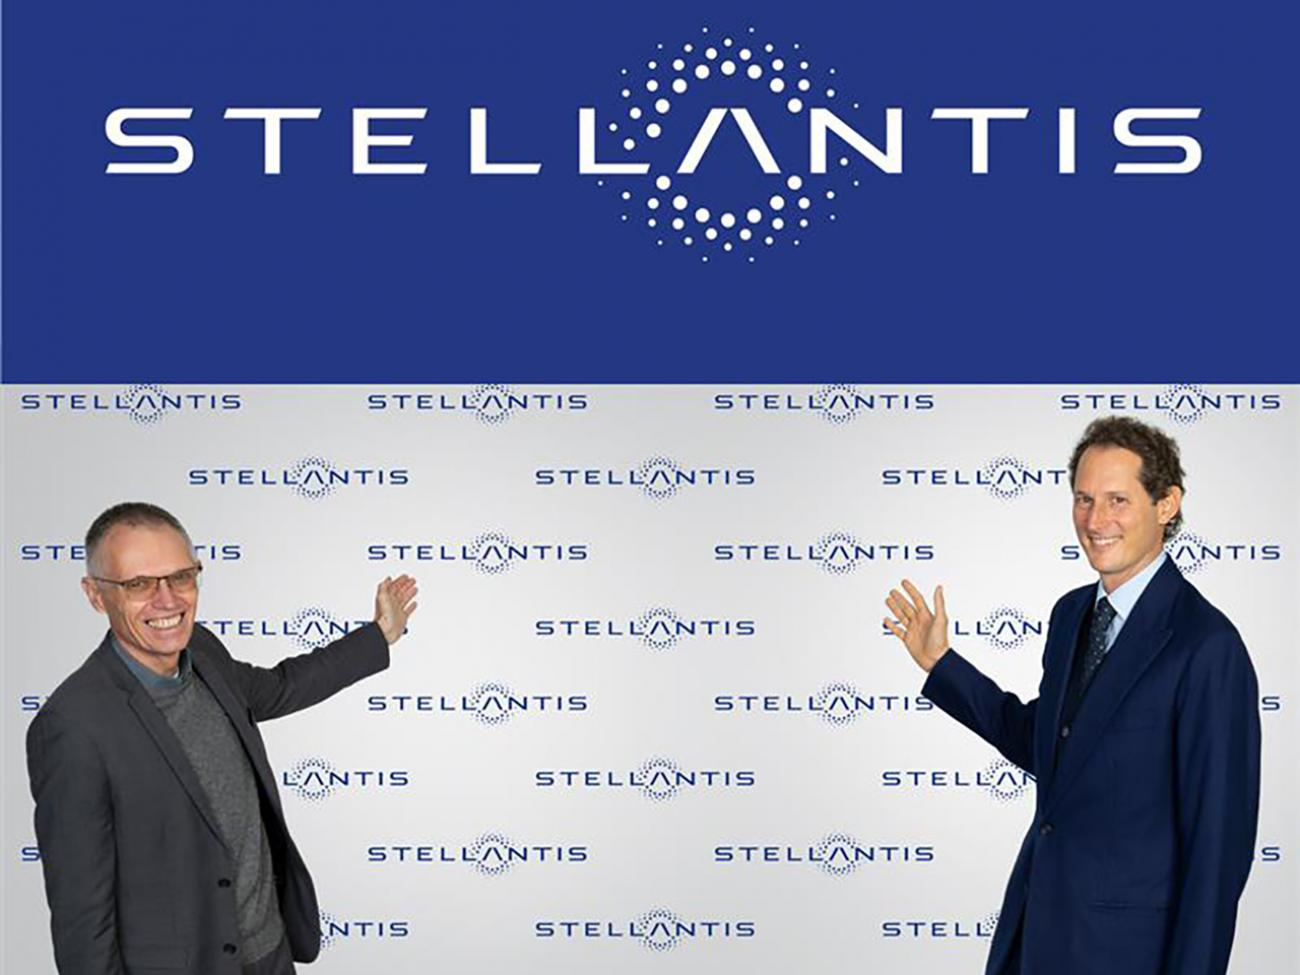 Stellantis 2121